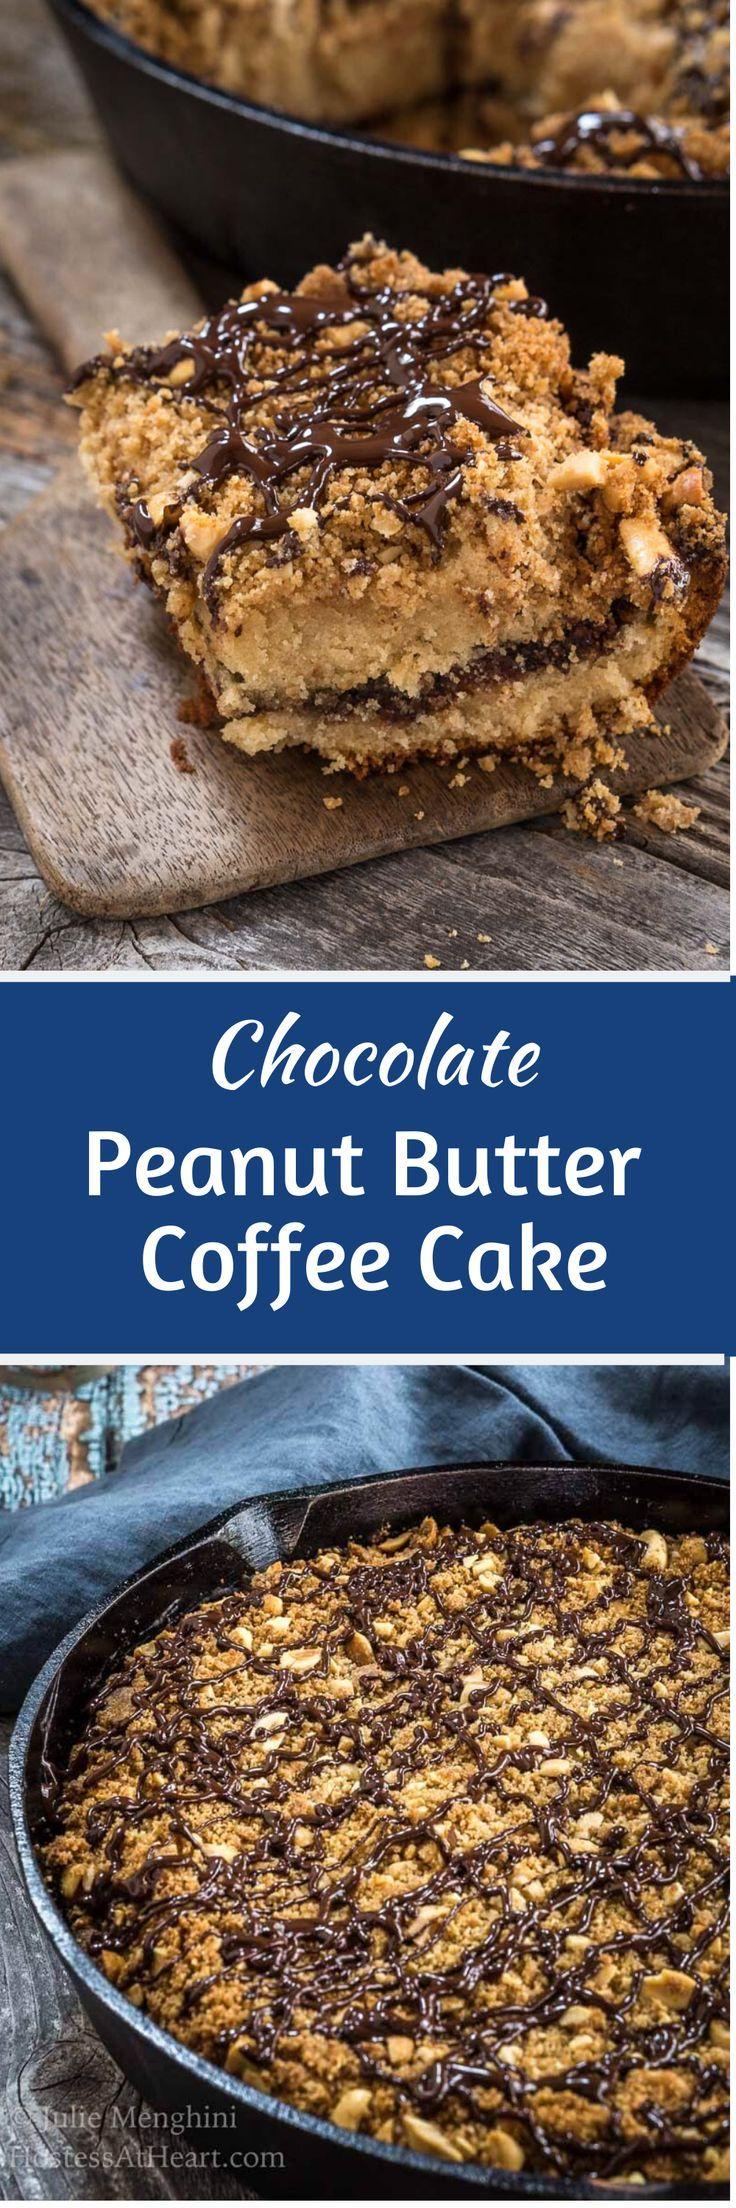 Chocolate peanut butter coffee cake is a sweet homemade